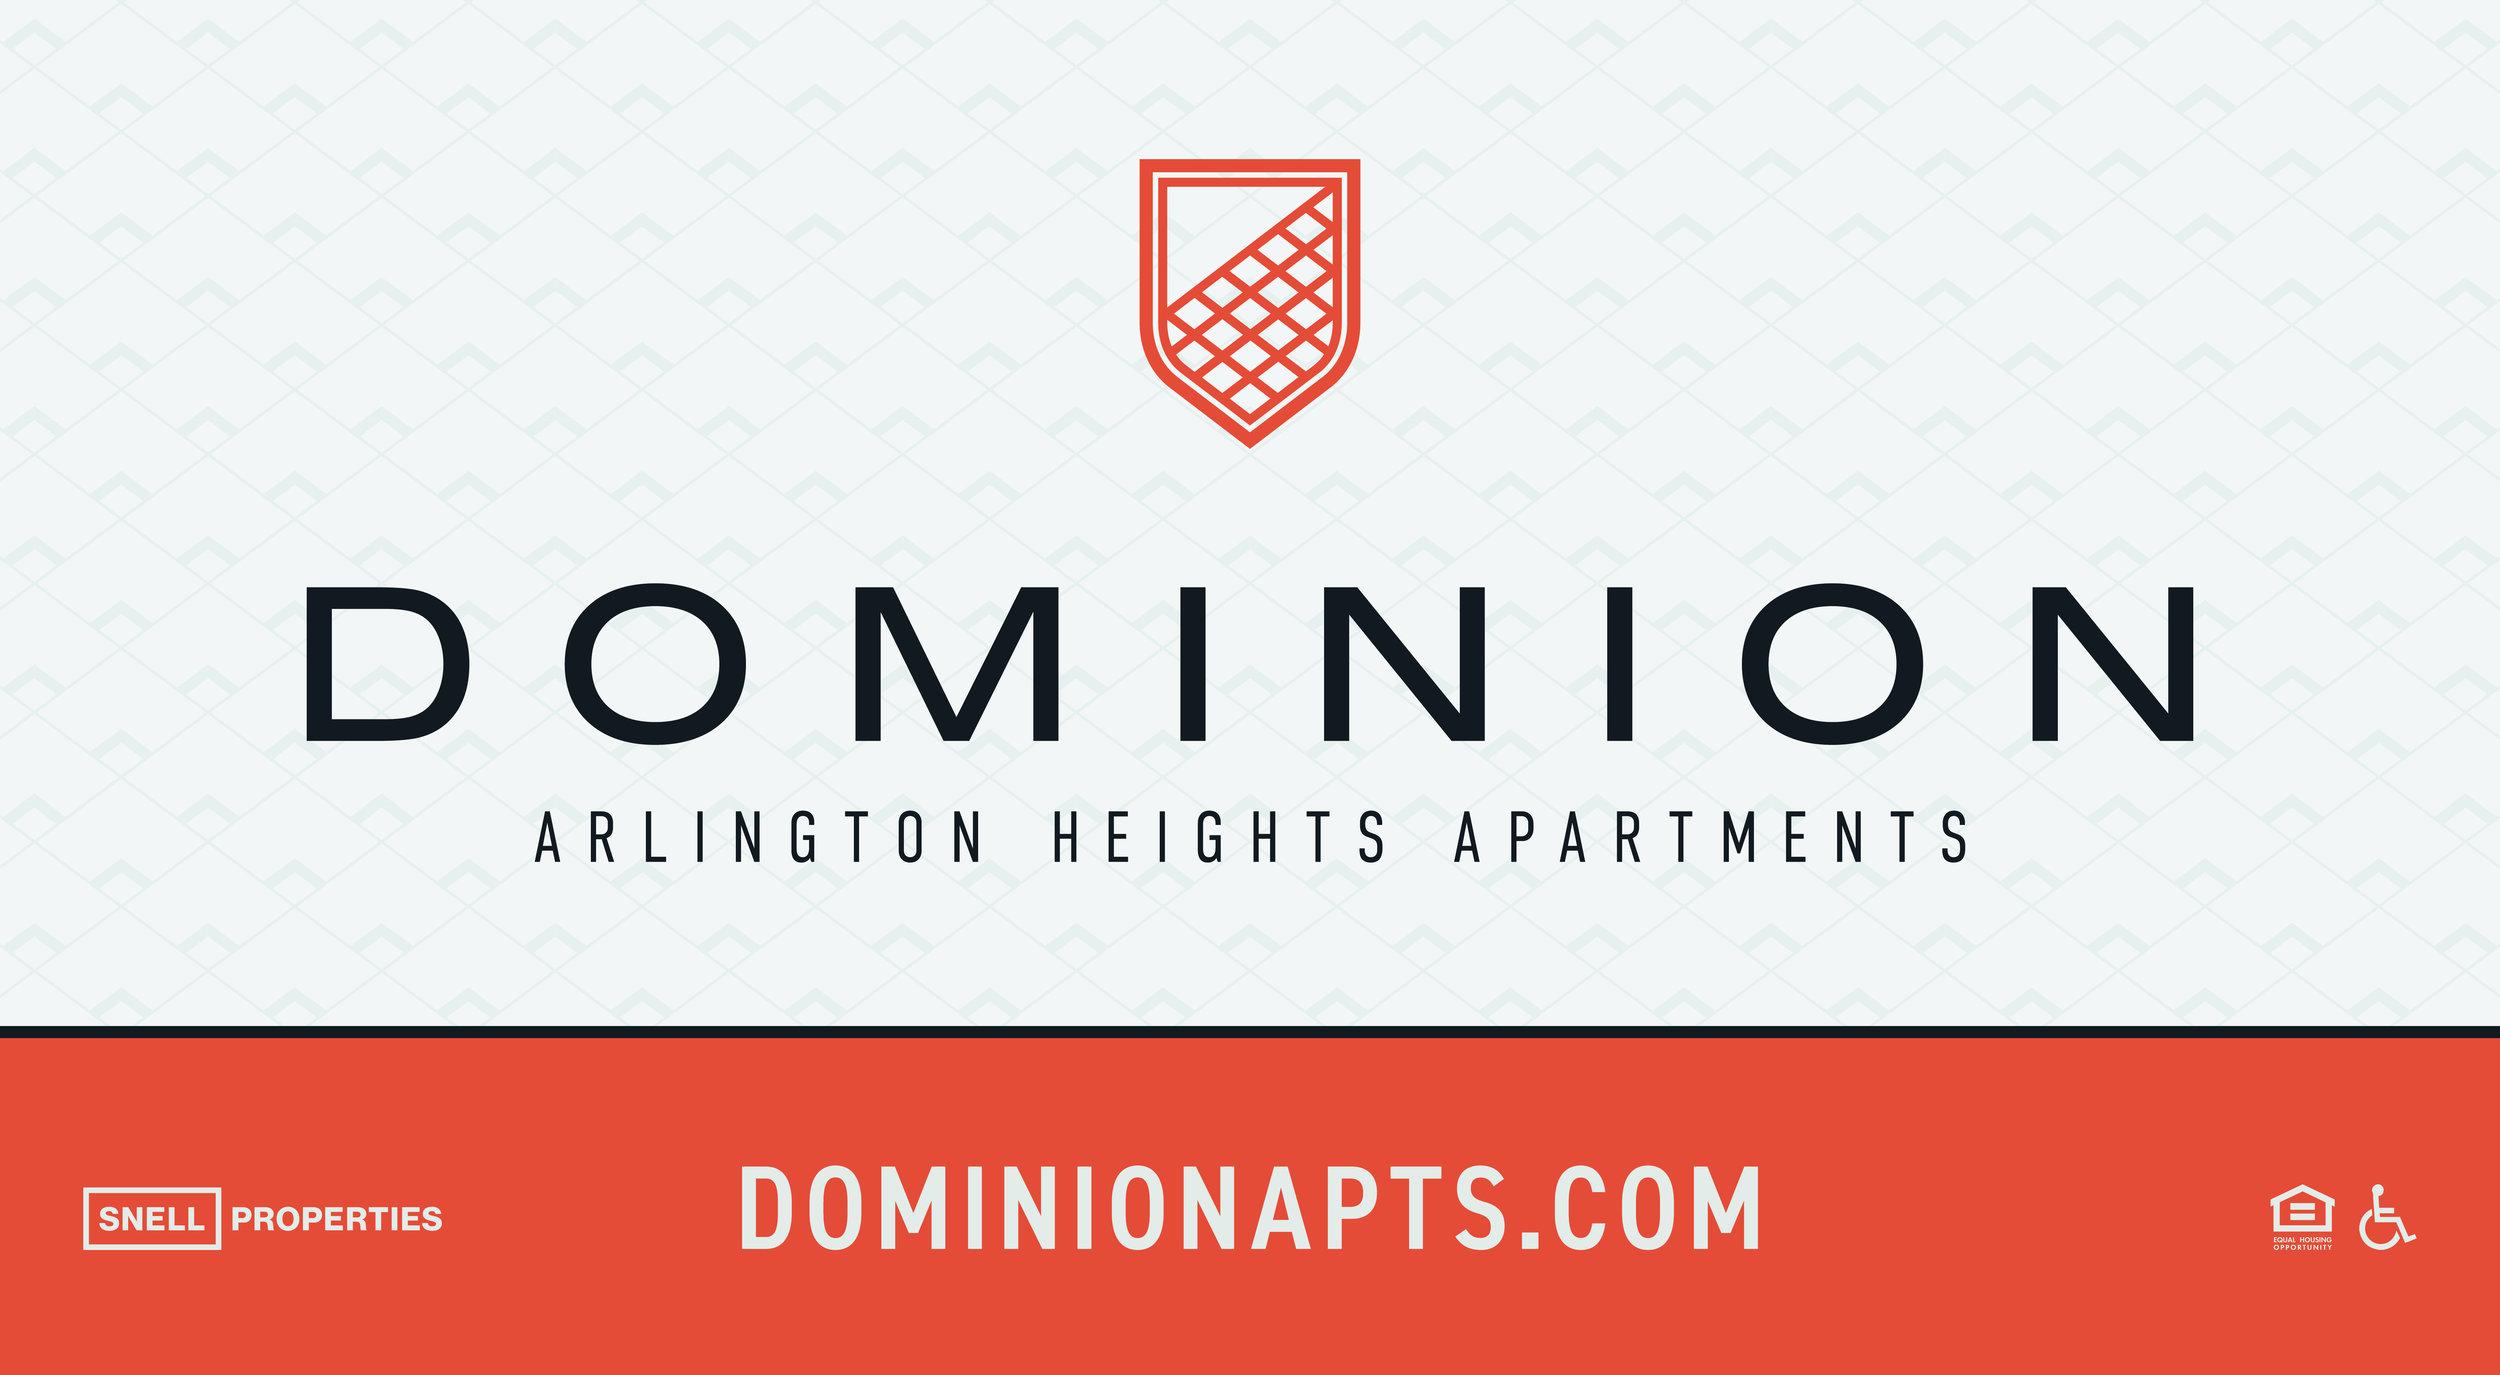 Dominion_FenceBanners7.jpg